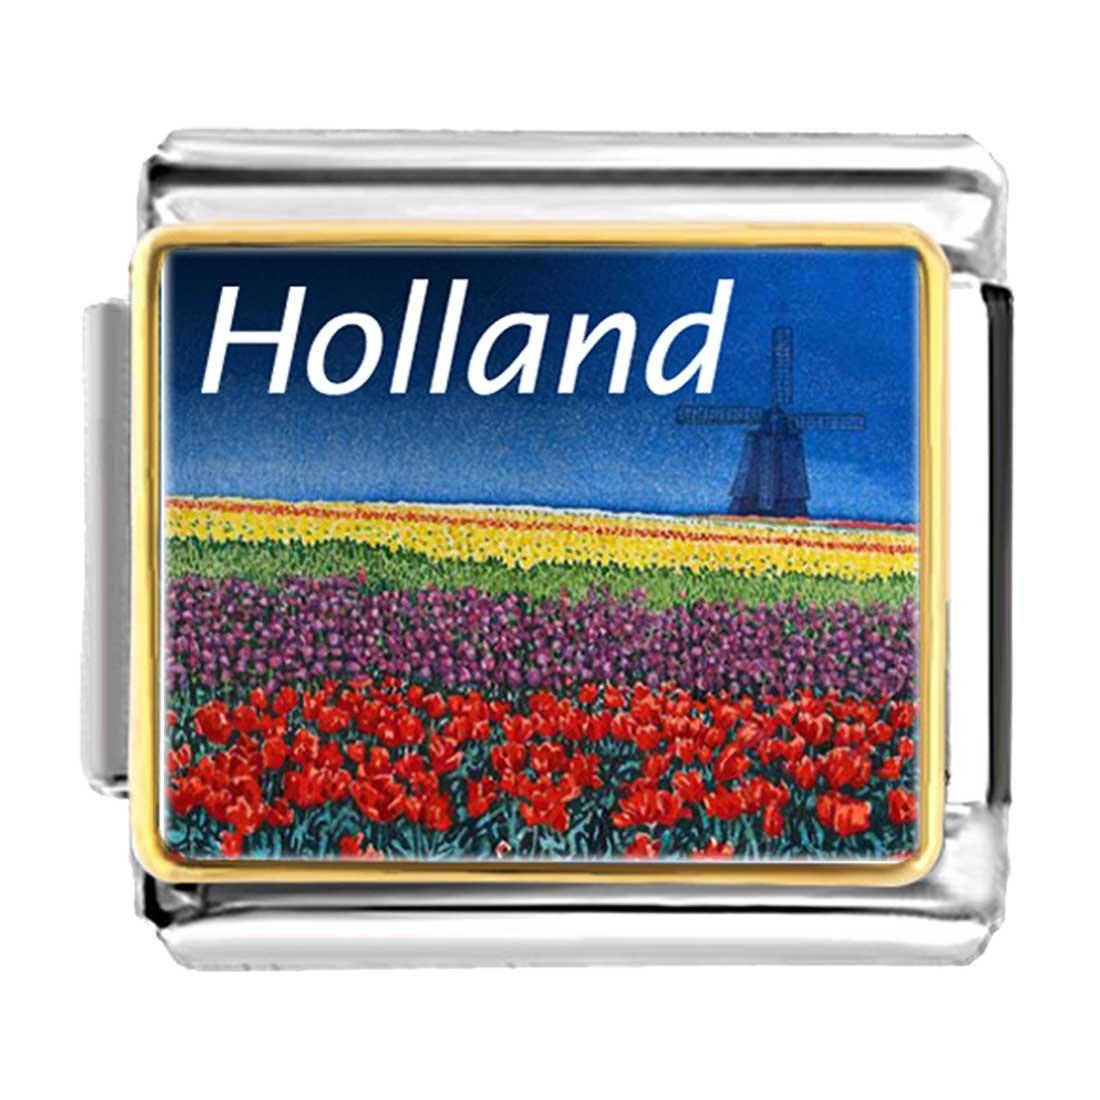 GiftJewelryShop Gold Plated Travel Holland Bracelet Link Photo Italian Charm Bracelets